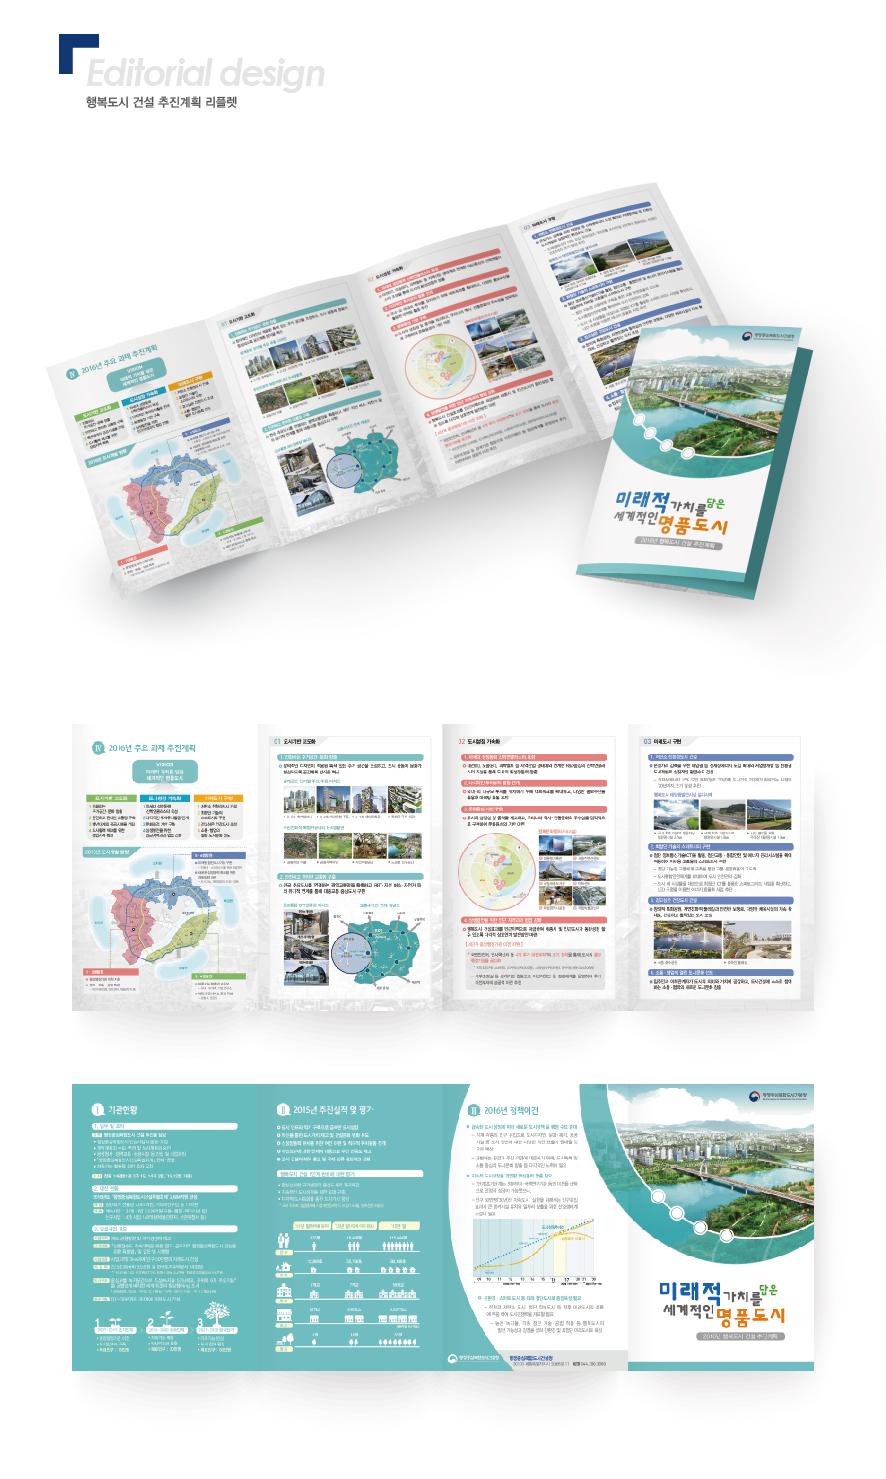 02 Editorial design-04.jpg